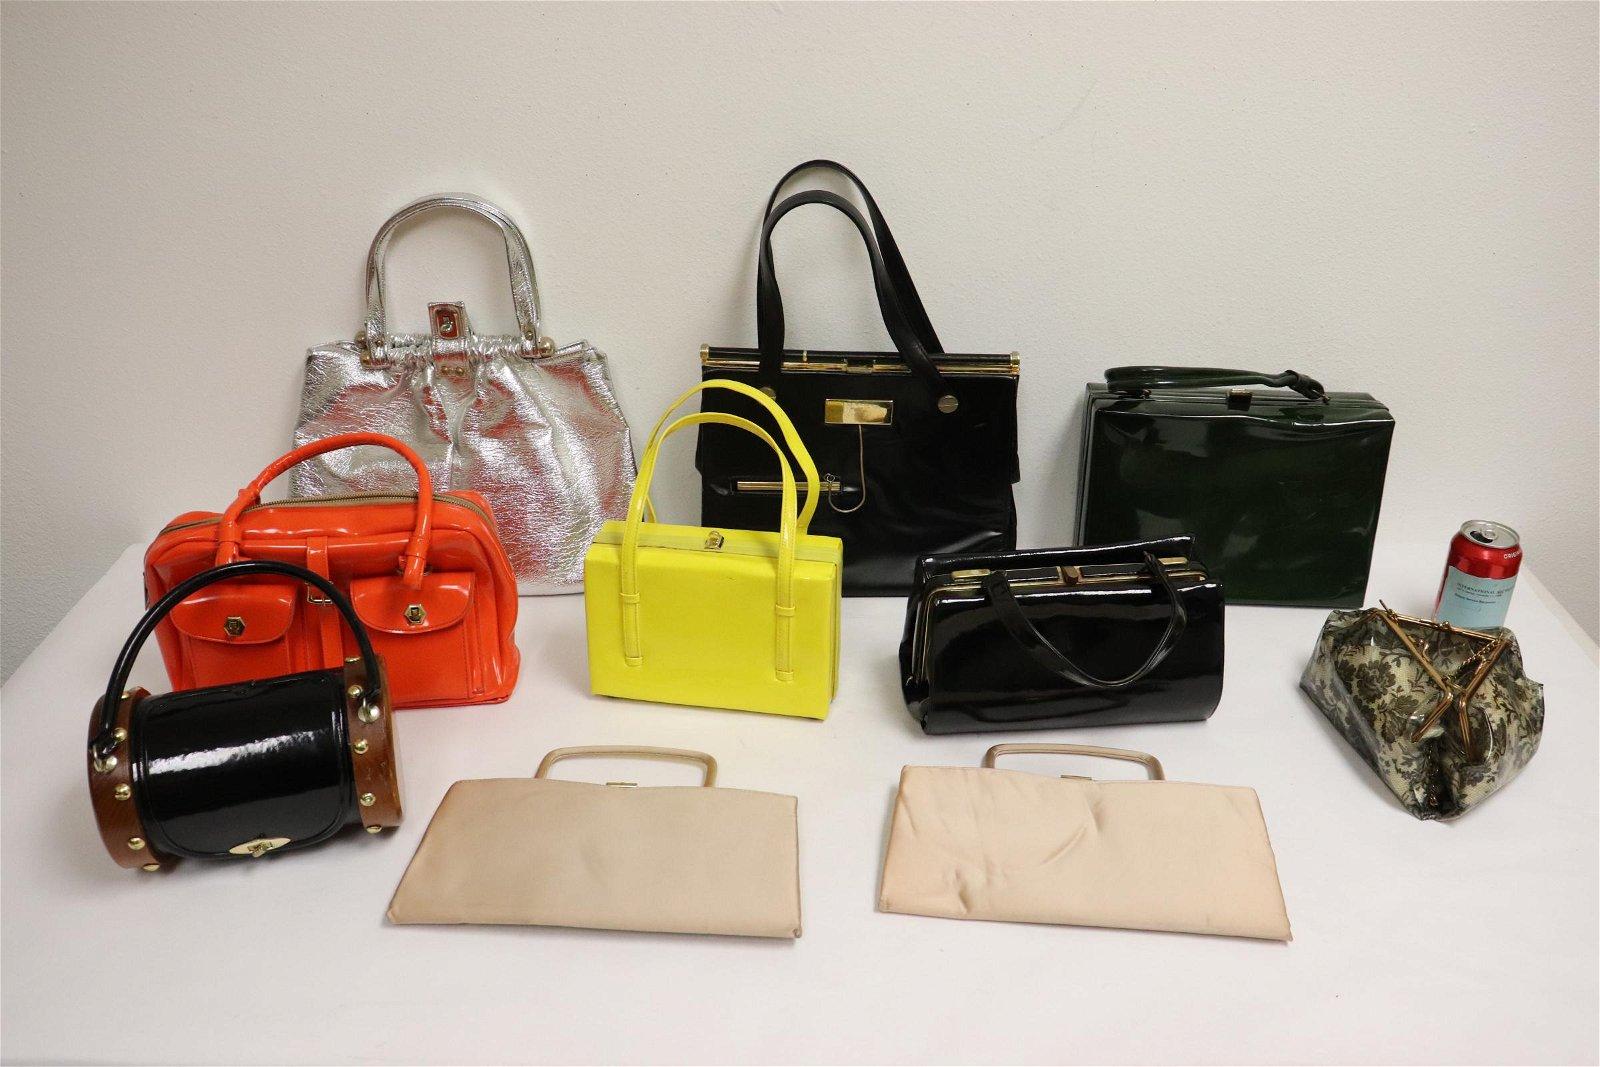 10 vintage evening purses/bags